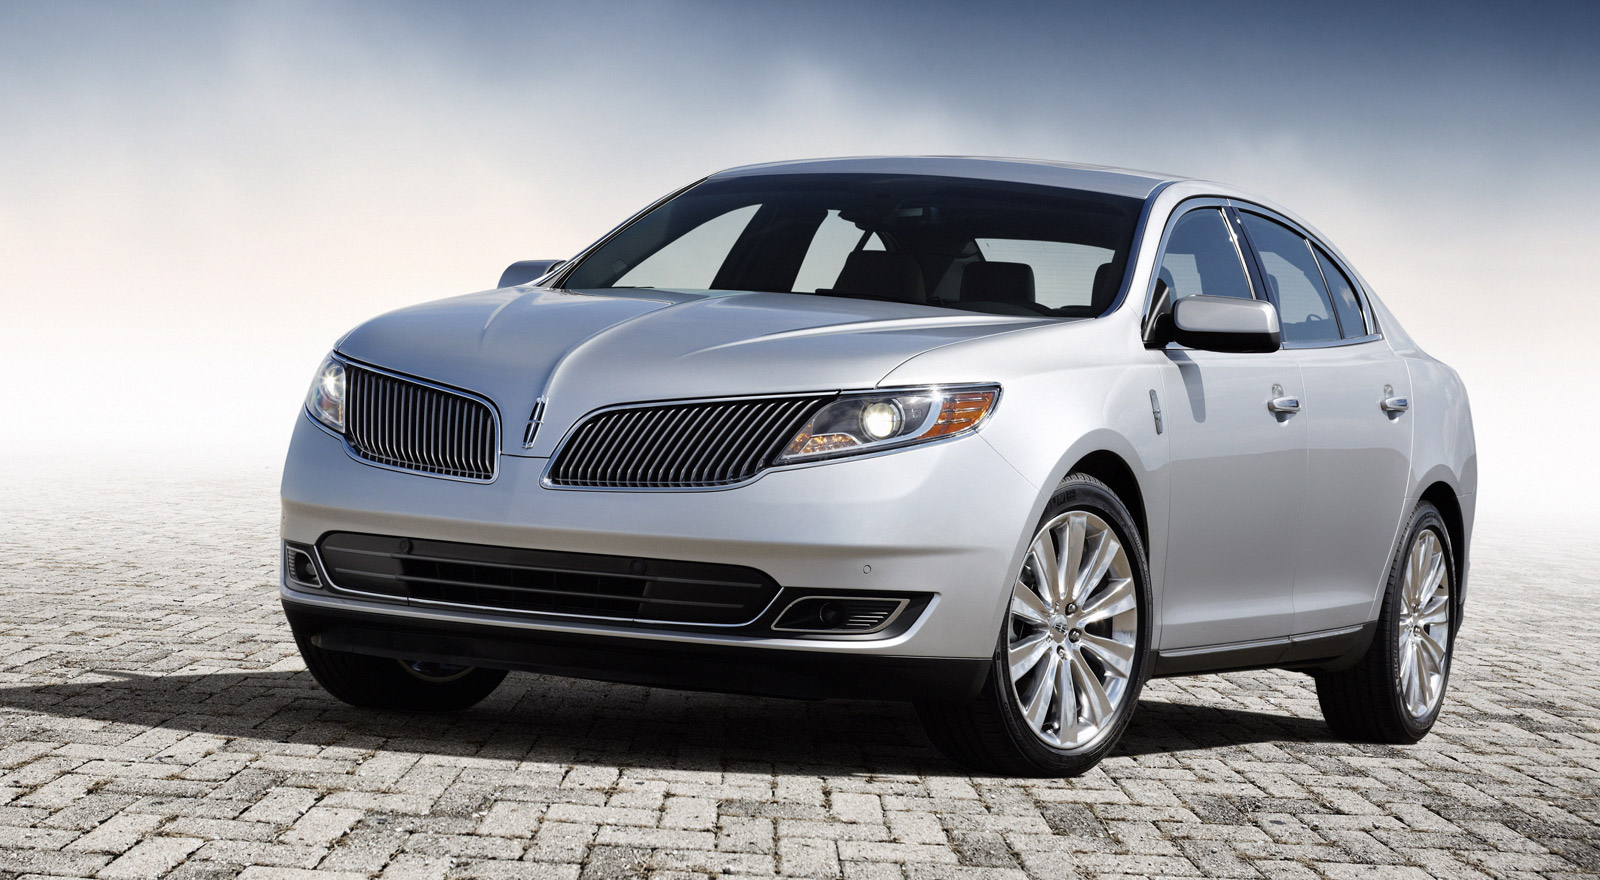 Lincoln Mks H